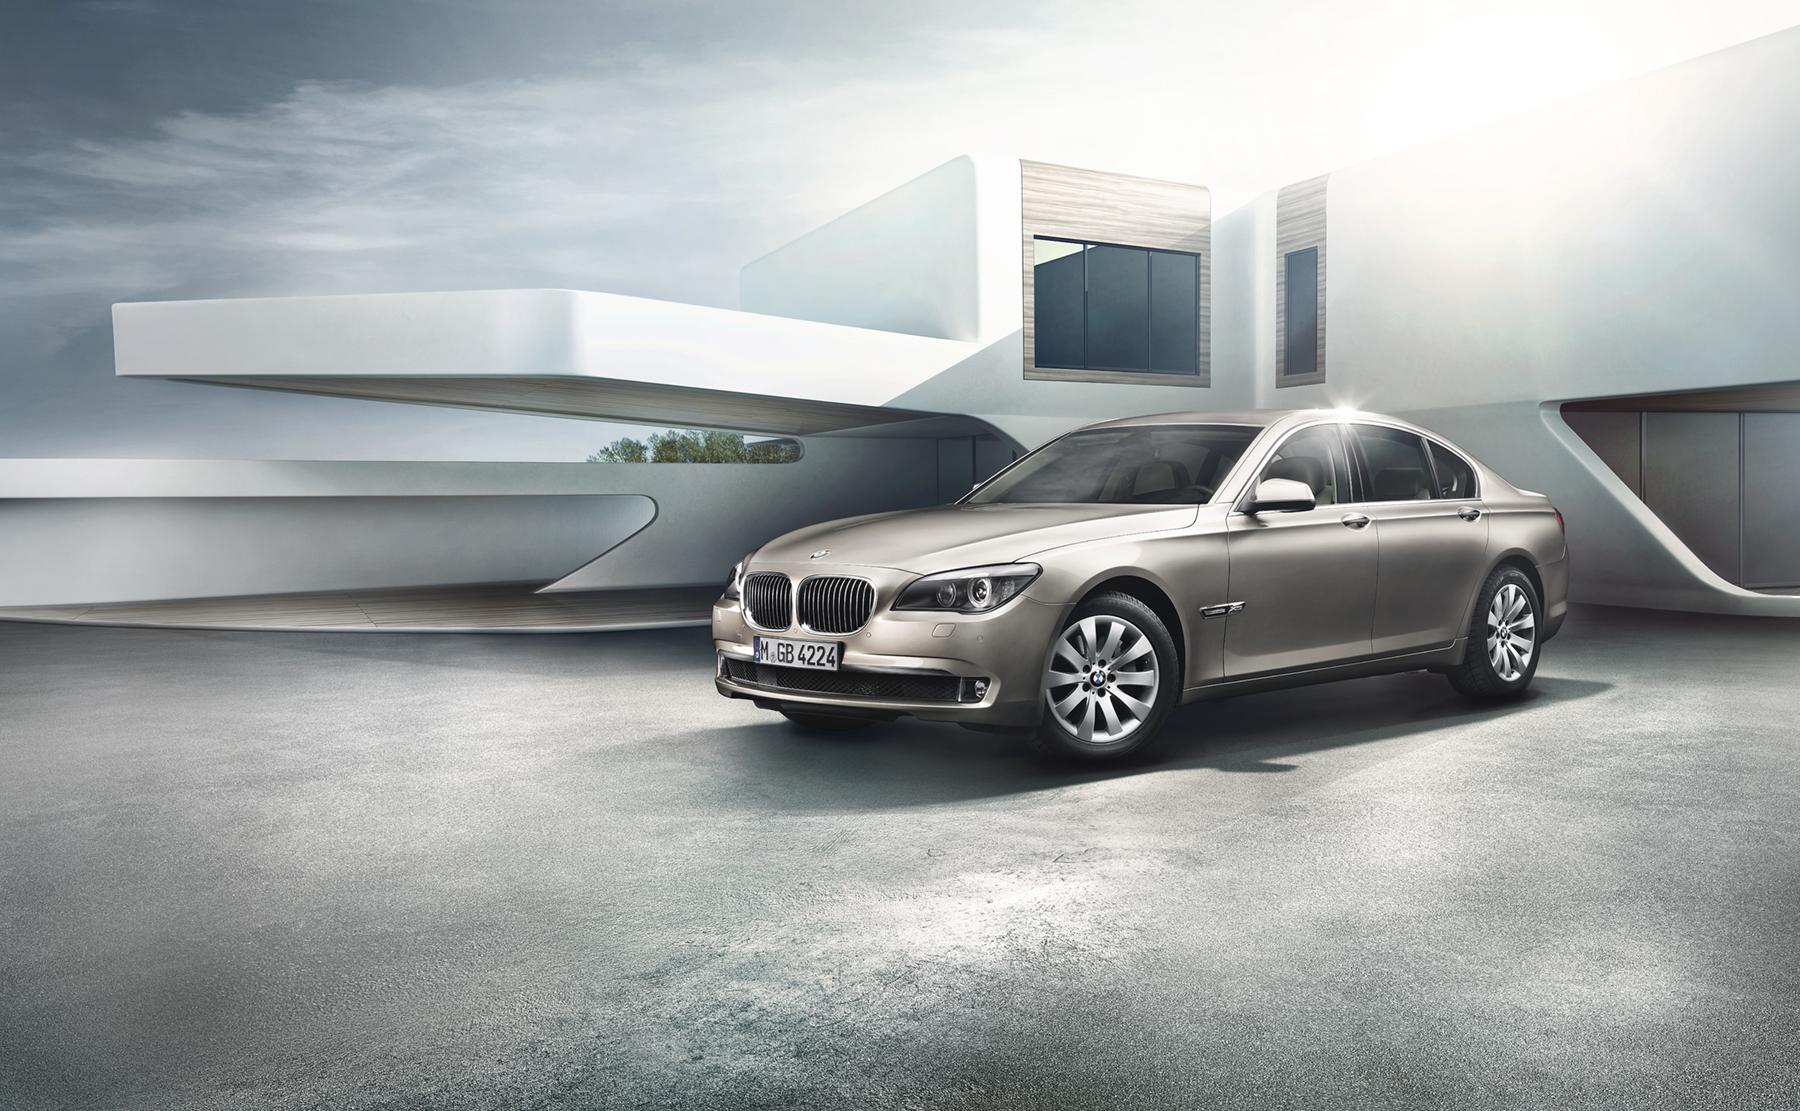 BMW 7er Autofotografie Stephan Bayer Fotografie